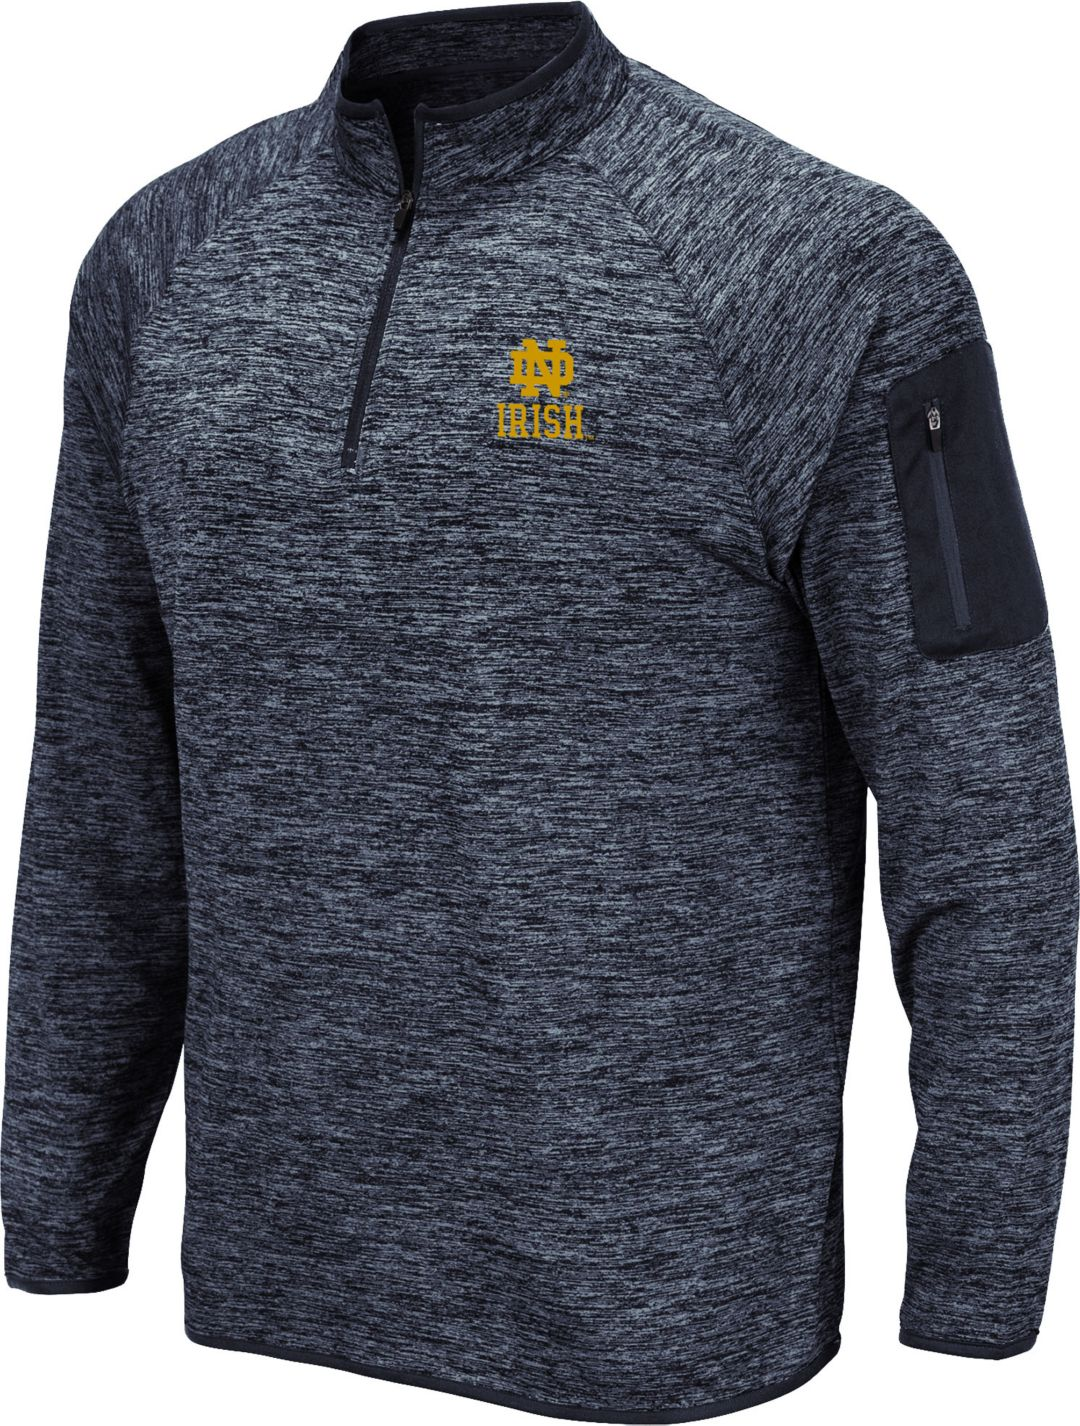 9fd120a7 Colosseum Men's Notre Dame Fighting Irish Navy Quarter-Zip Shirt.  noImageFound. 1